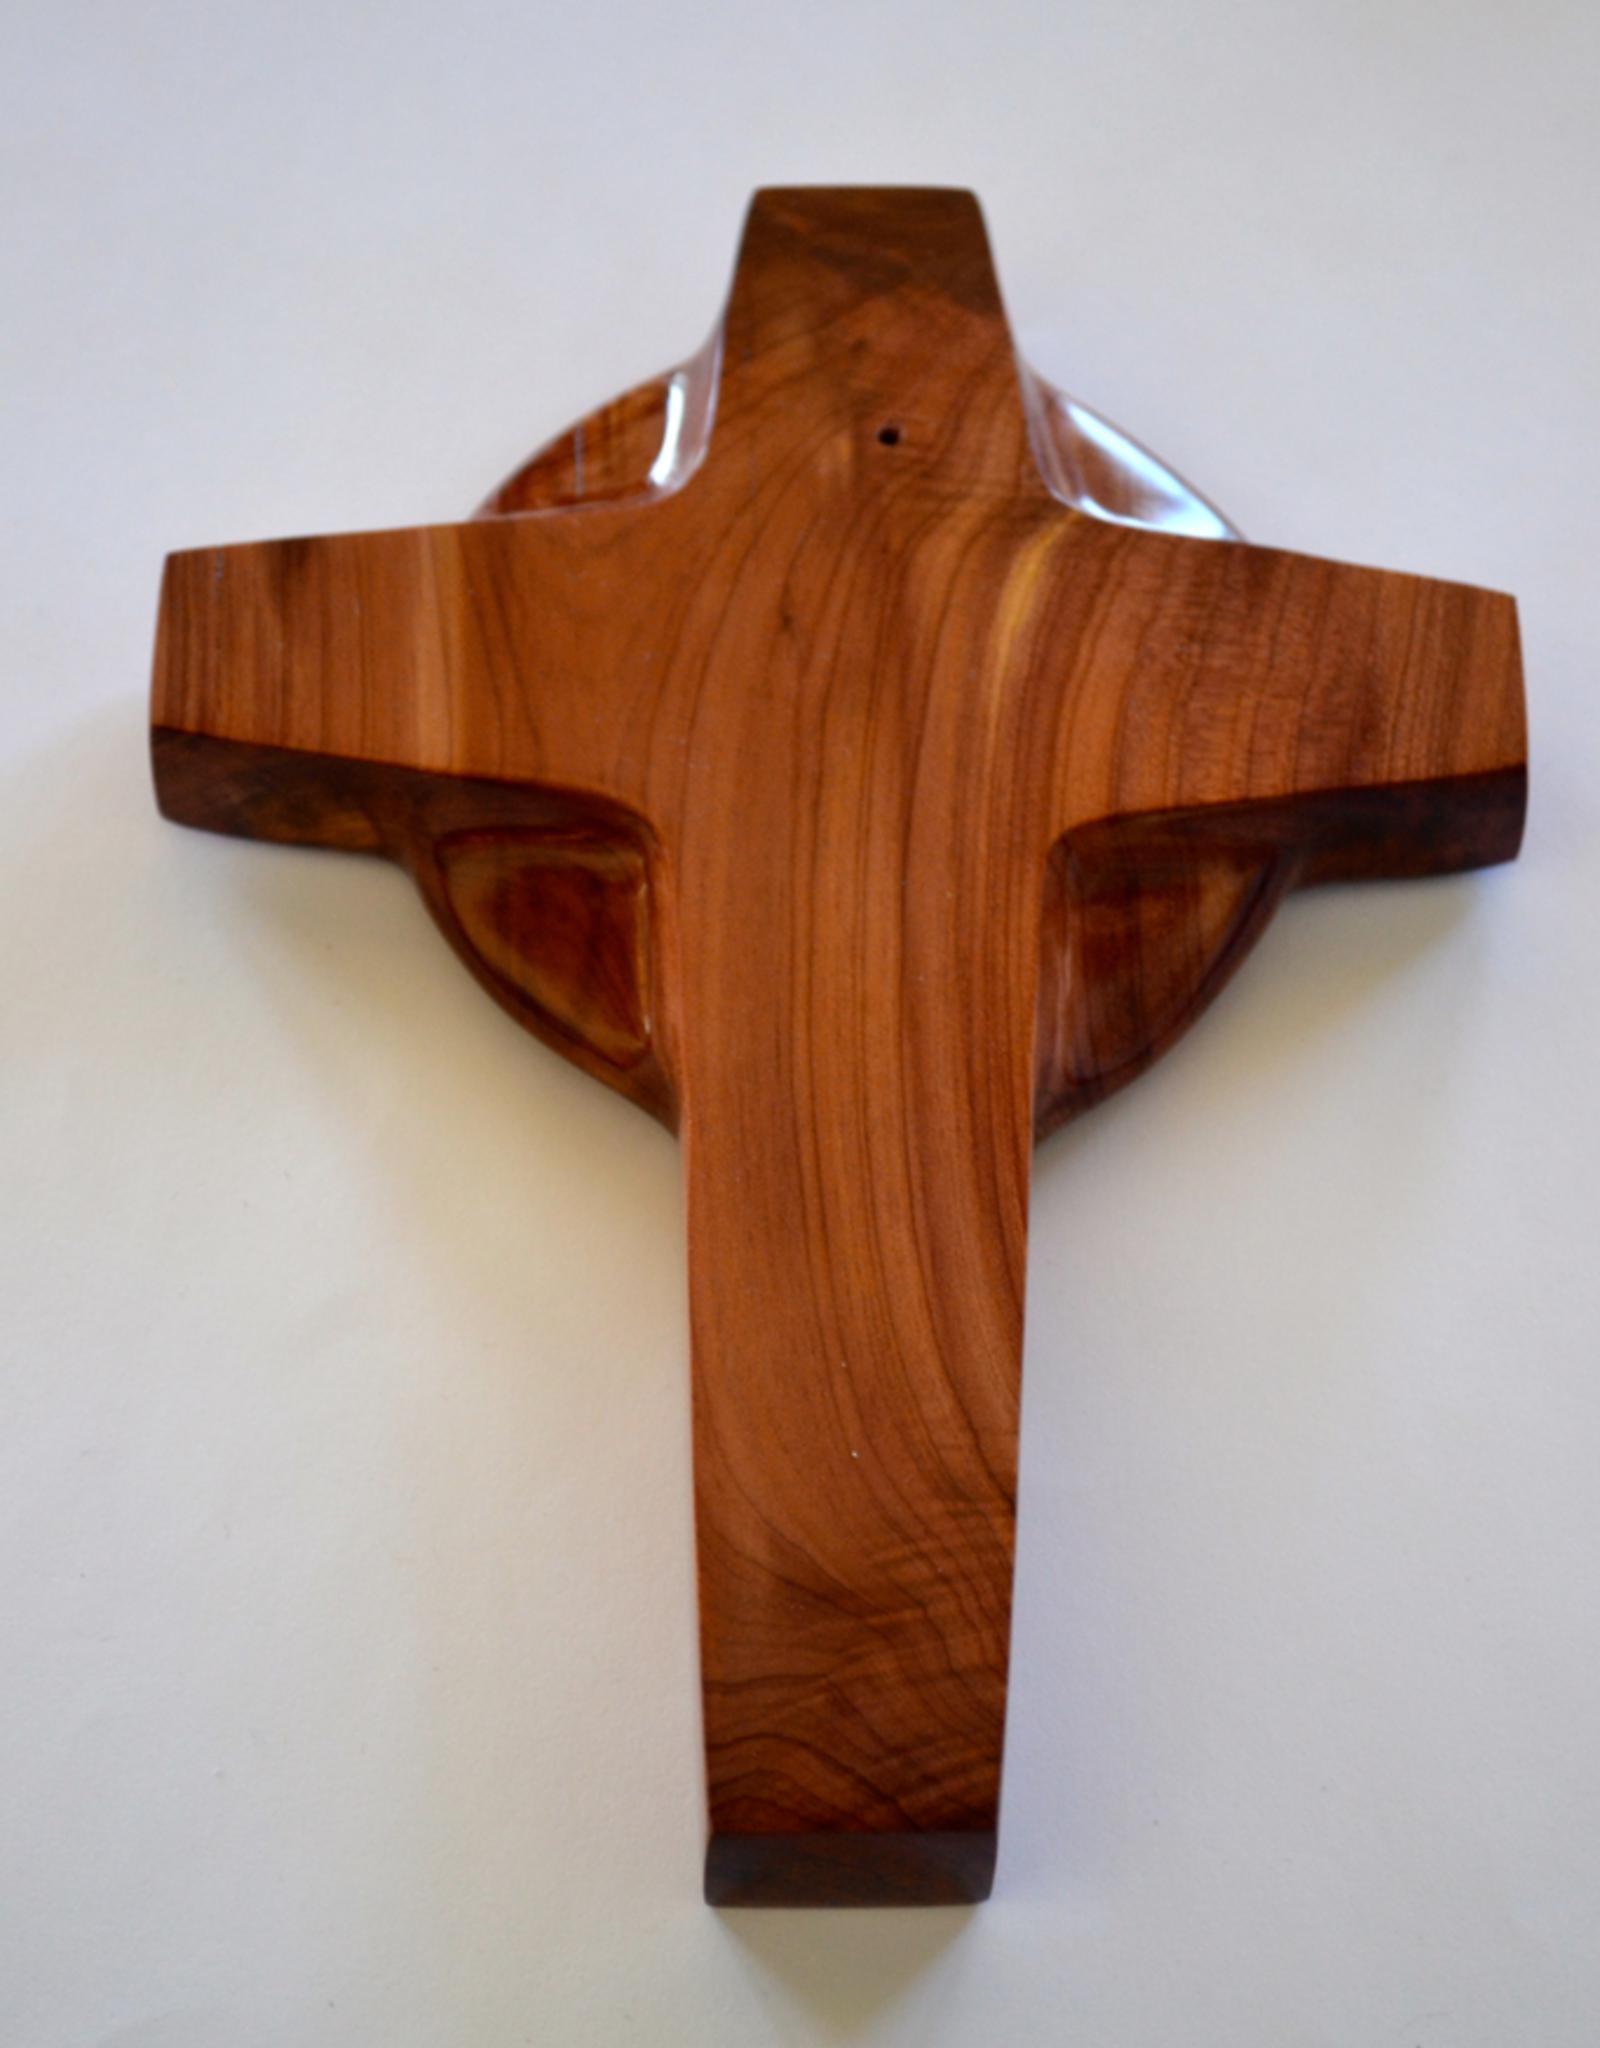 "Merry Crosses 7"" Merry Handcrafted Aromatic Cedar Celtic Wall Cross"